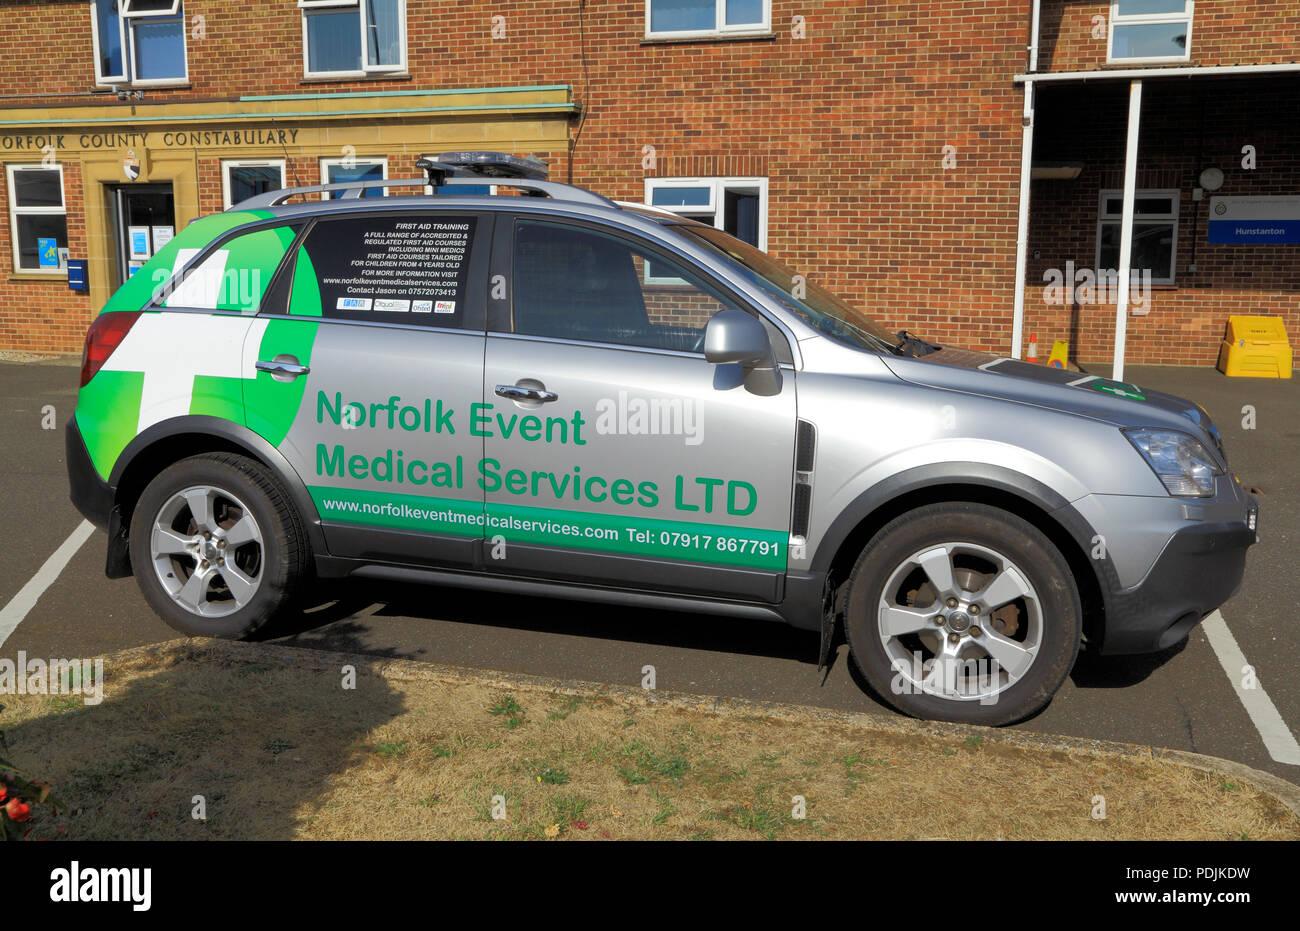 Norfolk Event, Medical Services, vehicle, emergency, service, Hunstanton, UK Stock Photo